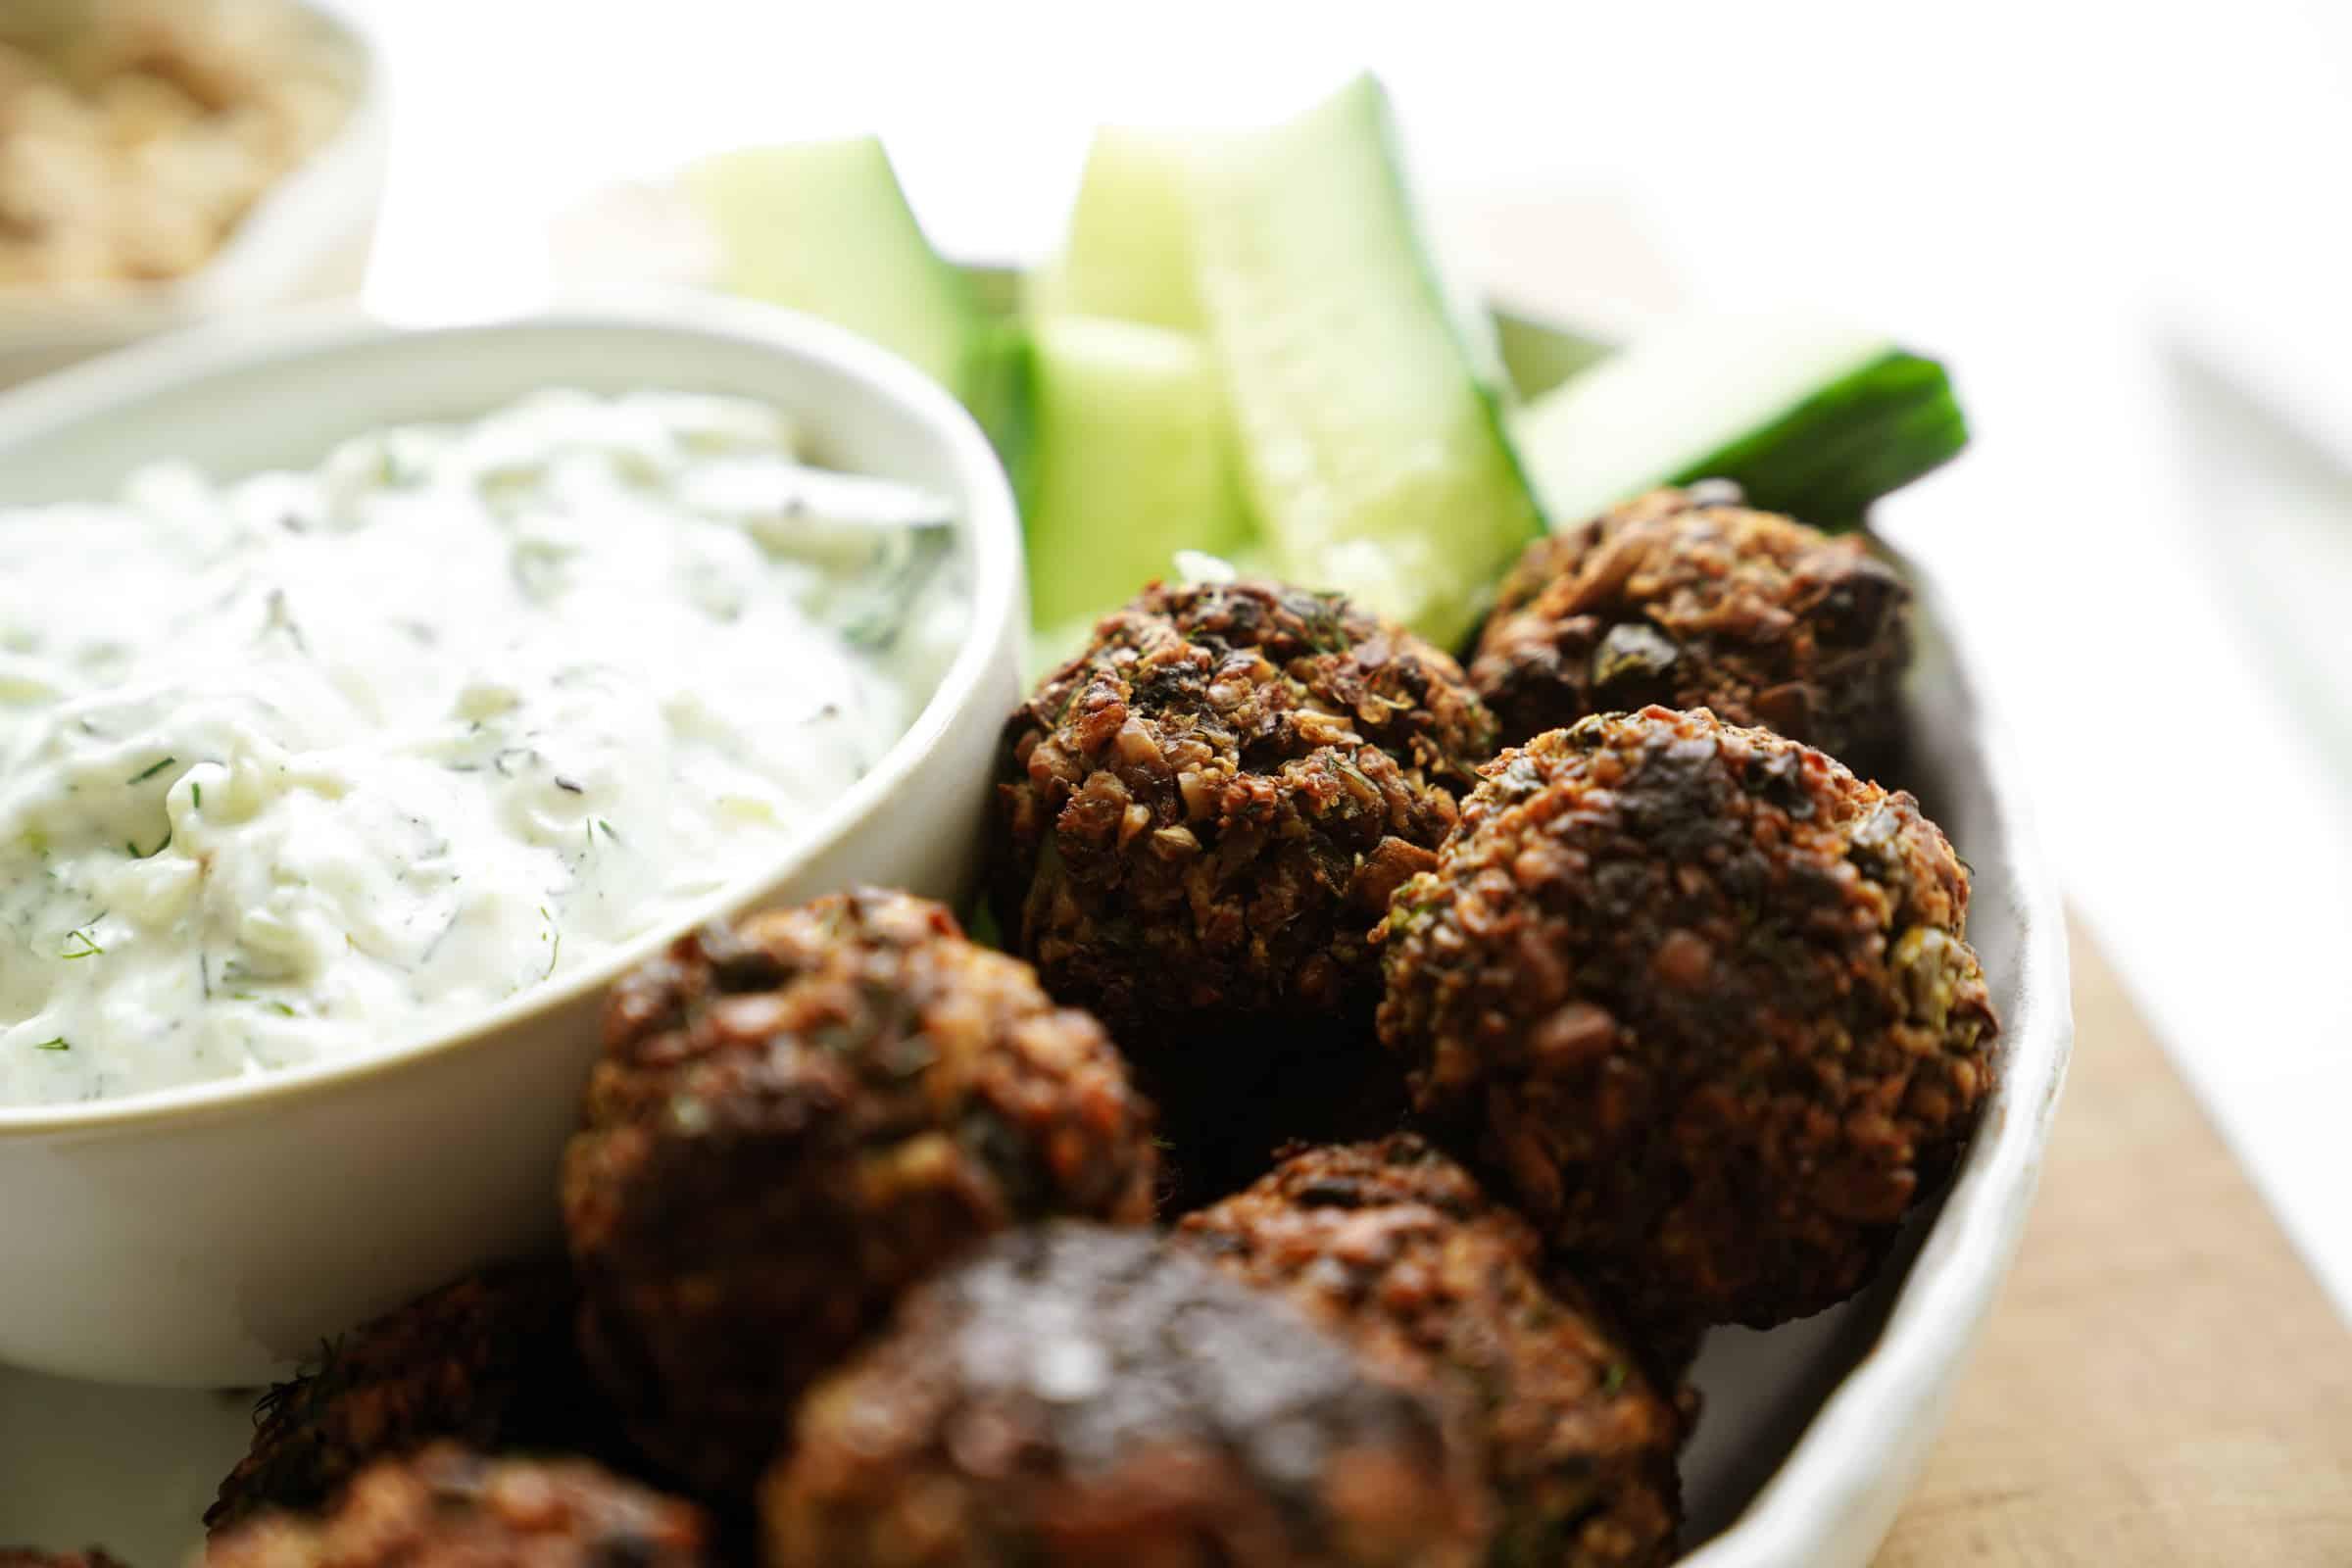 Walnut meatballs close-up on a serving dish